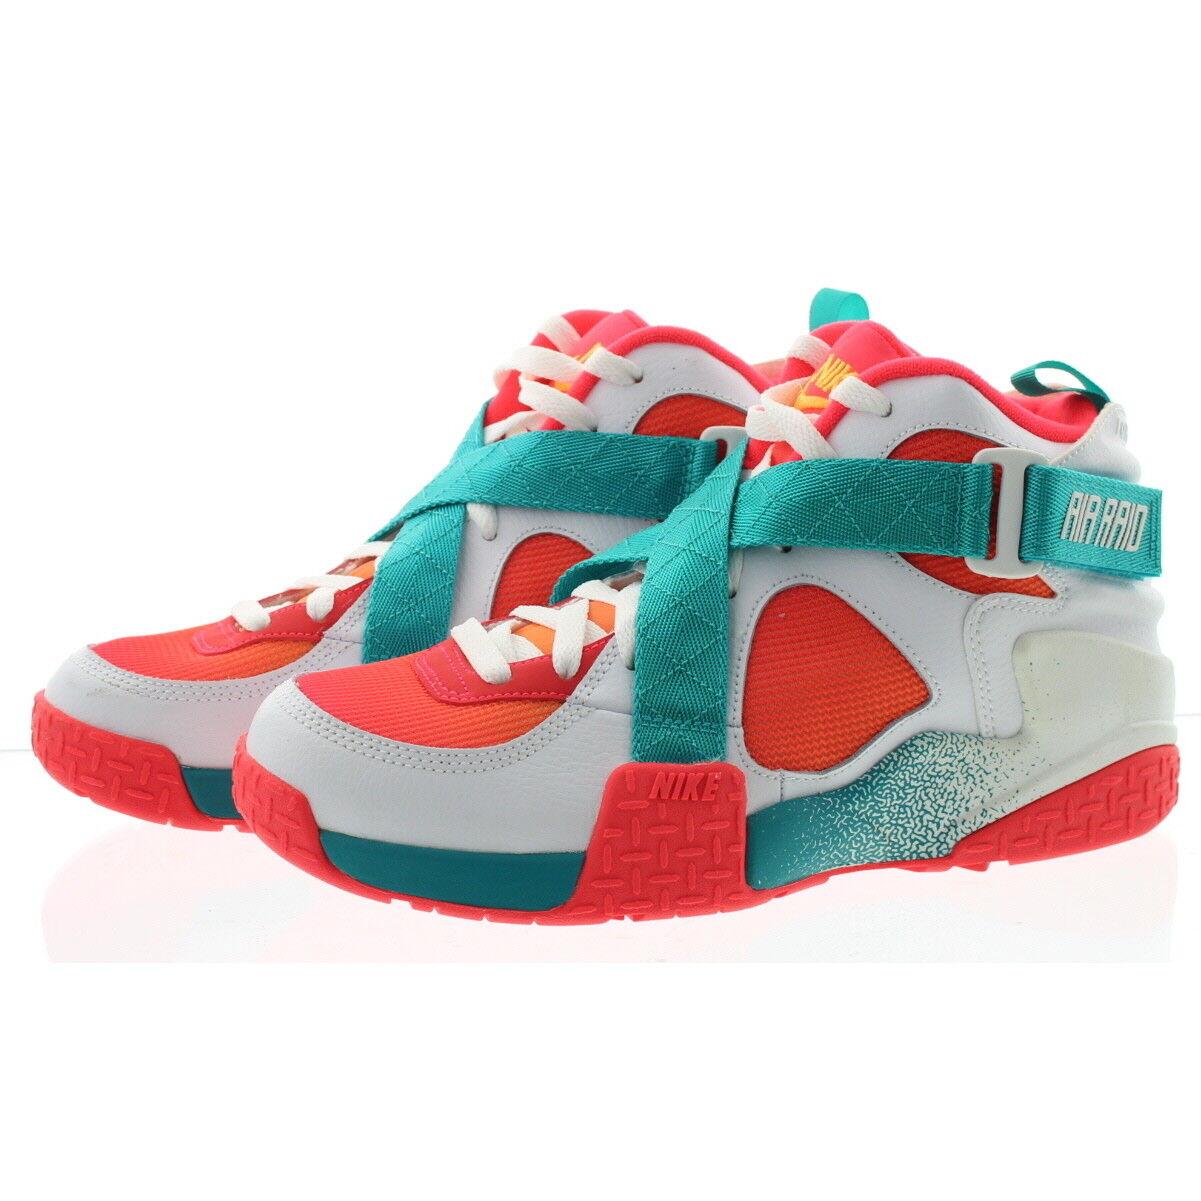 Nike 642359-100 Mens Air Breeze Raid Breeze Air Outdoor Basketball Shoes Sneakers d000c5